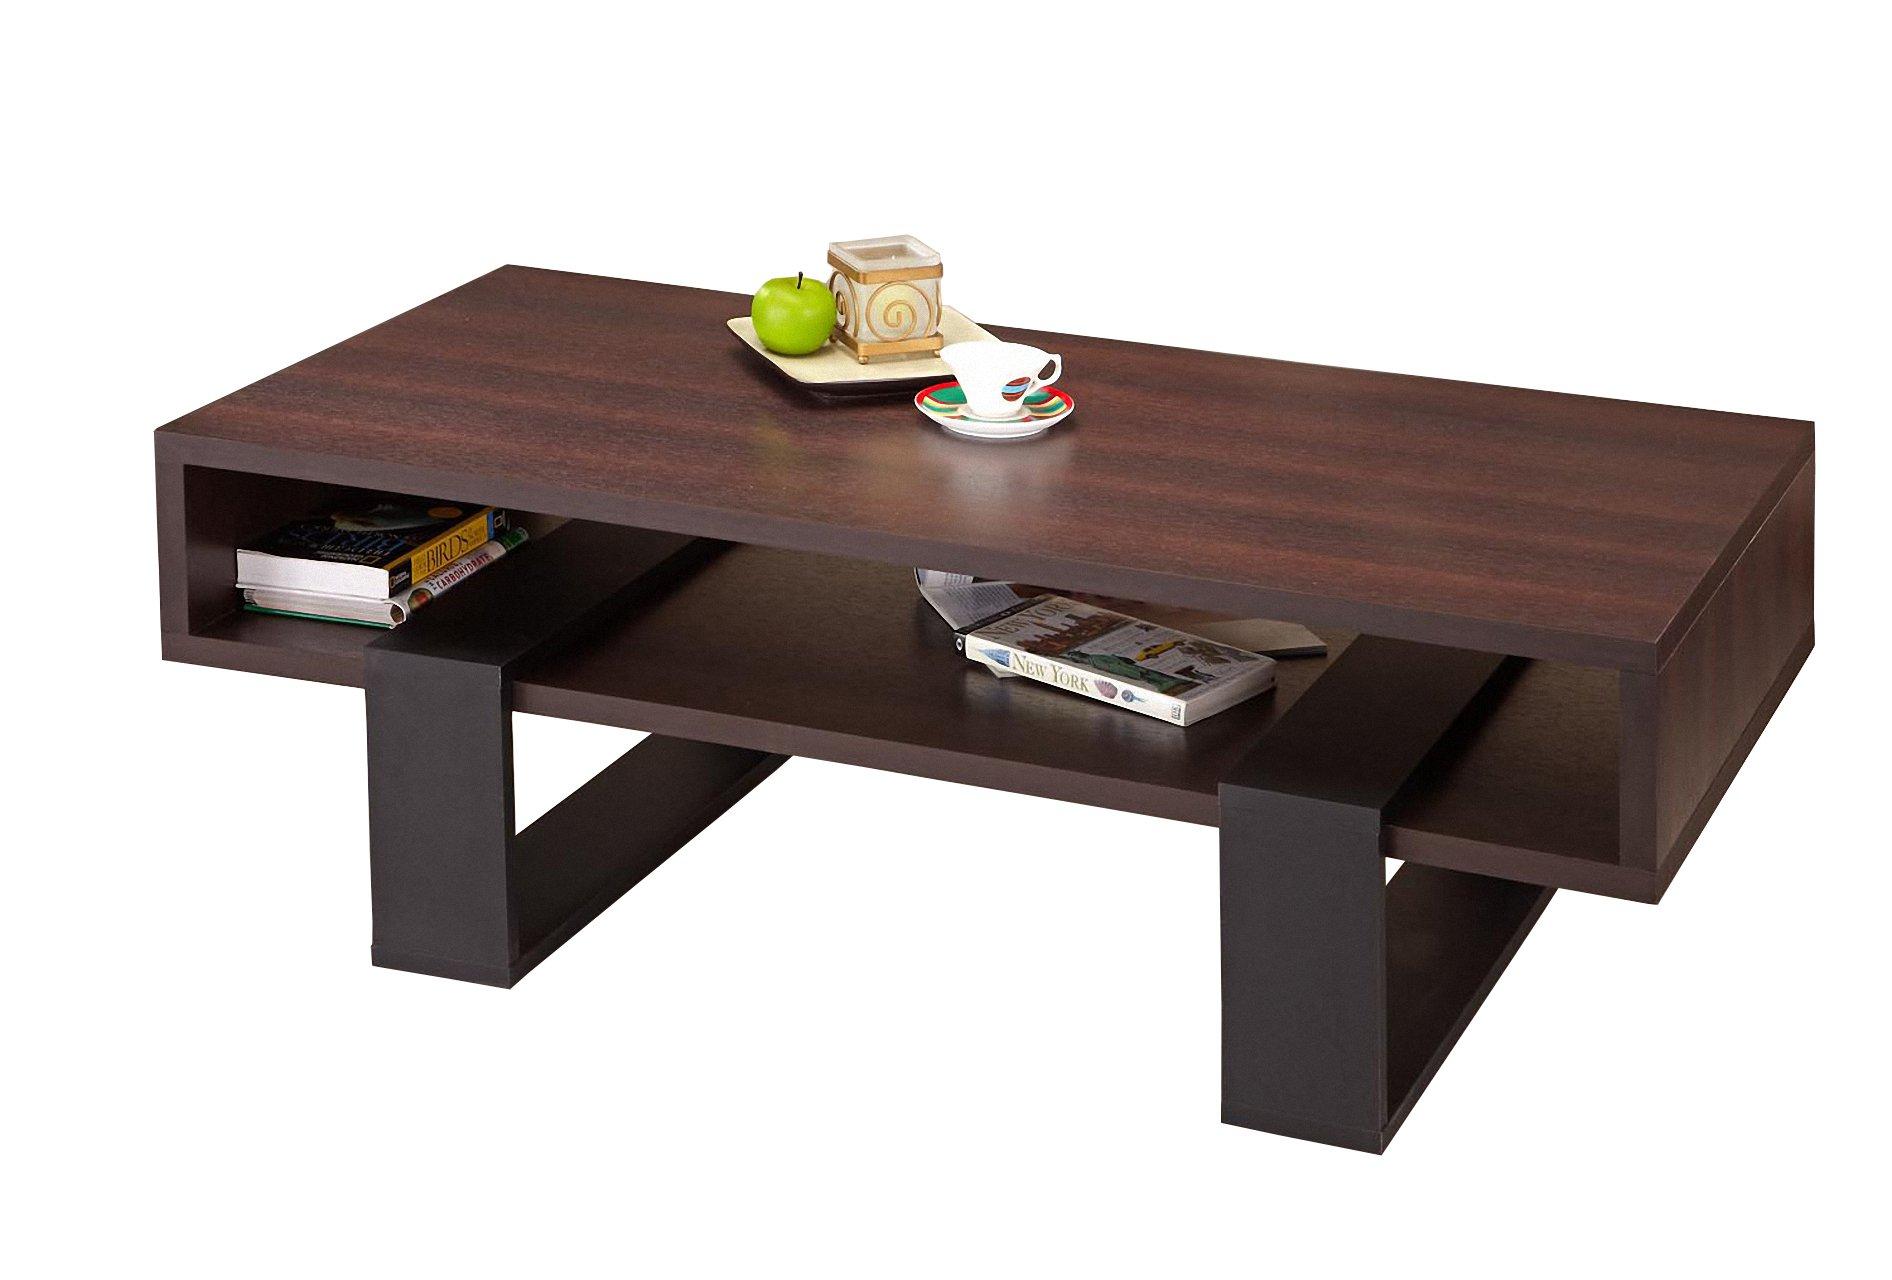 ioHOMES Monroe Rectangular Coffee Table, Walnut and Black